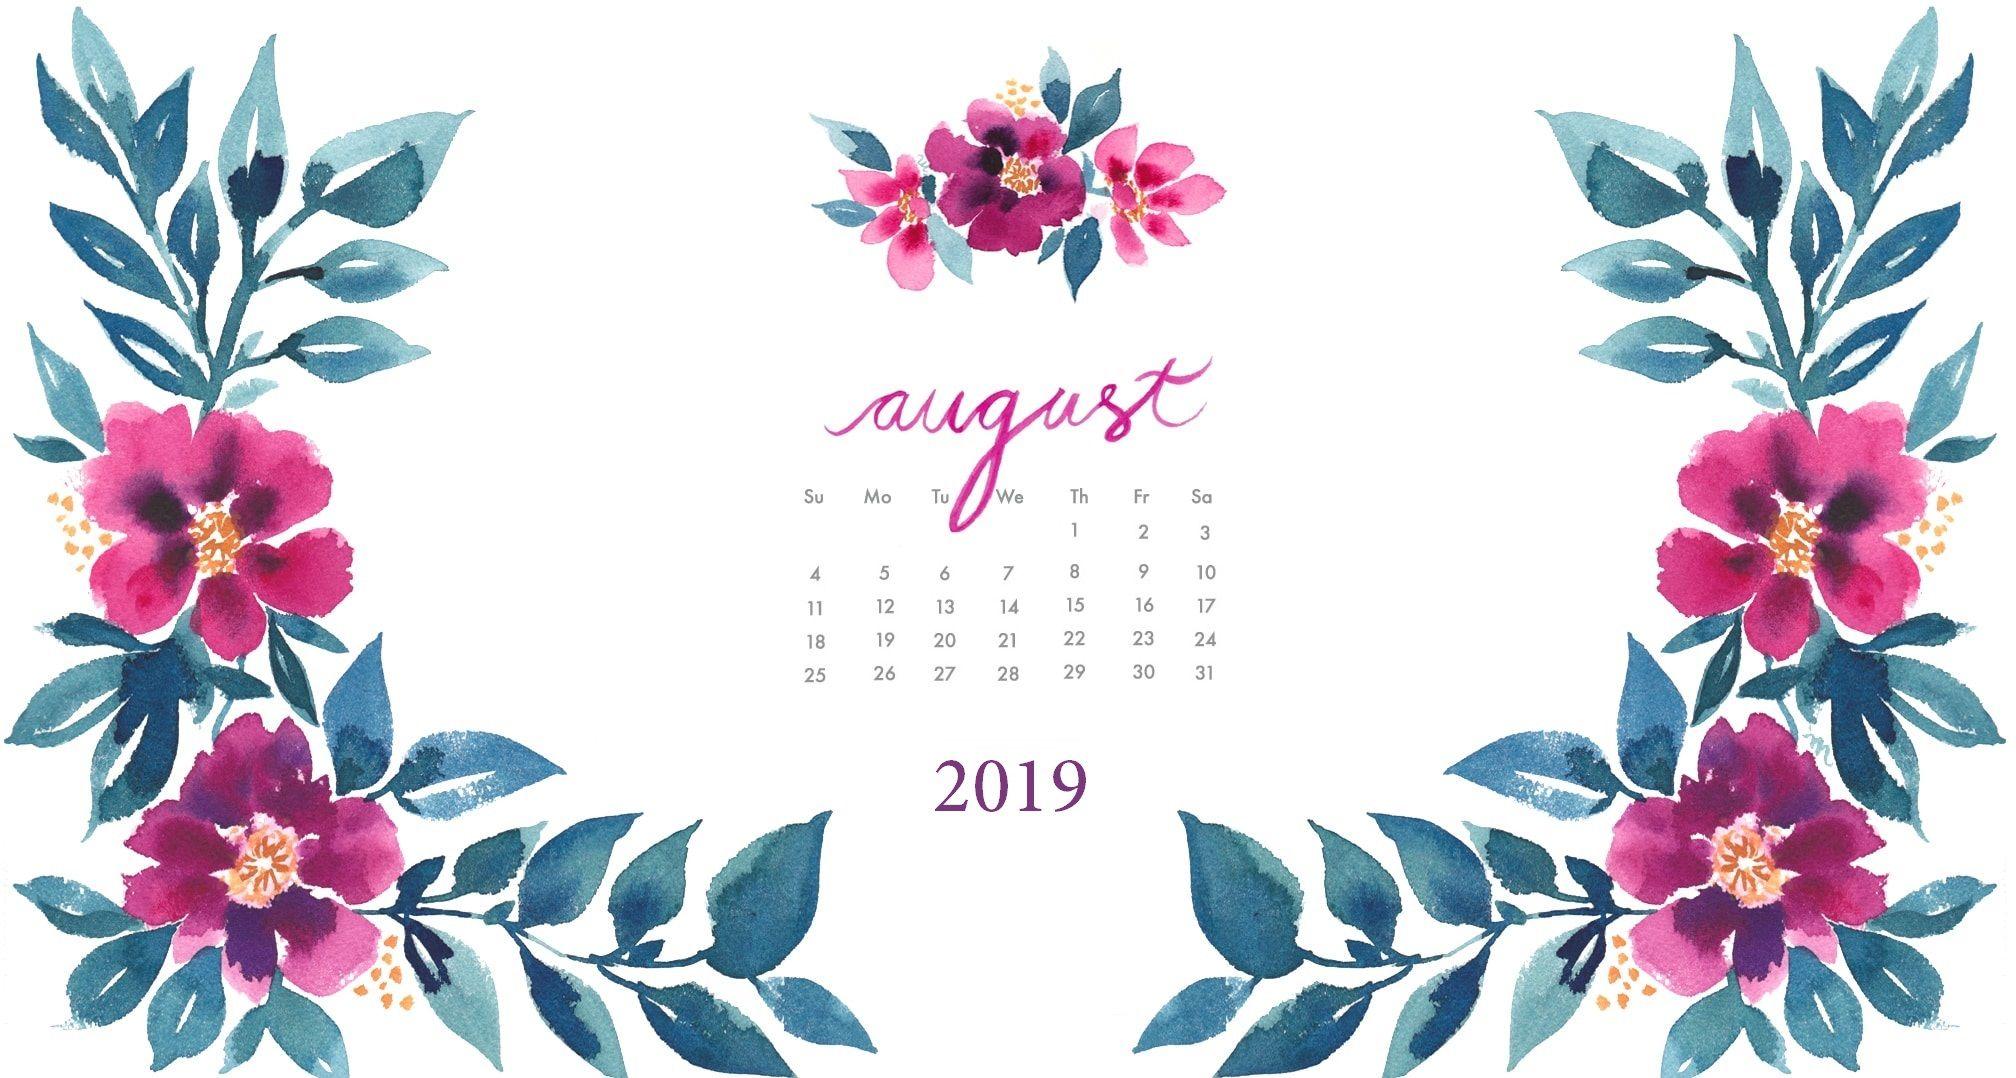 August 2019 calendar desktop wallpaper with images